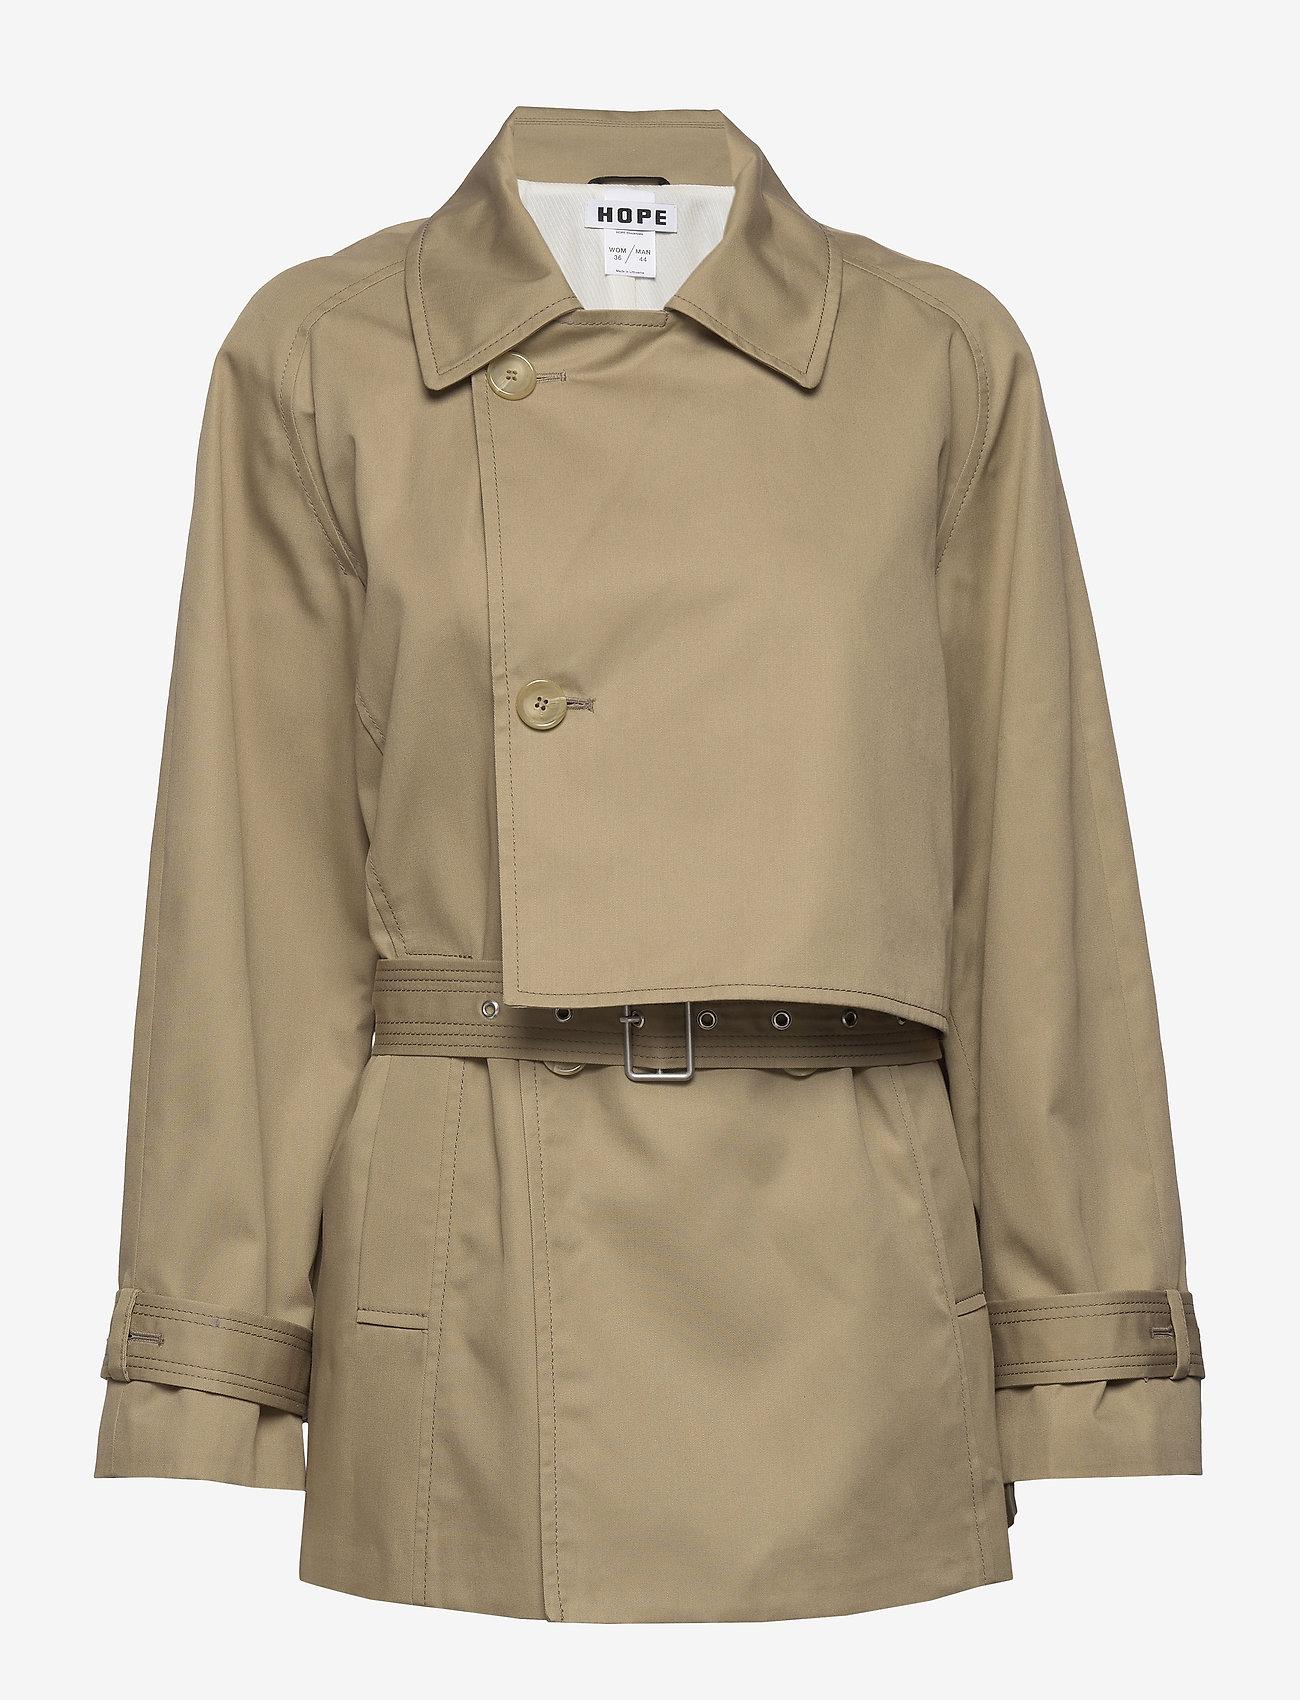 Hope Trace Jacket - Jackets & Coats